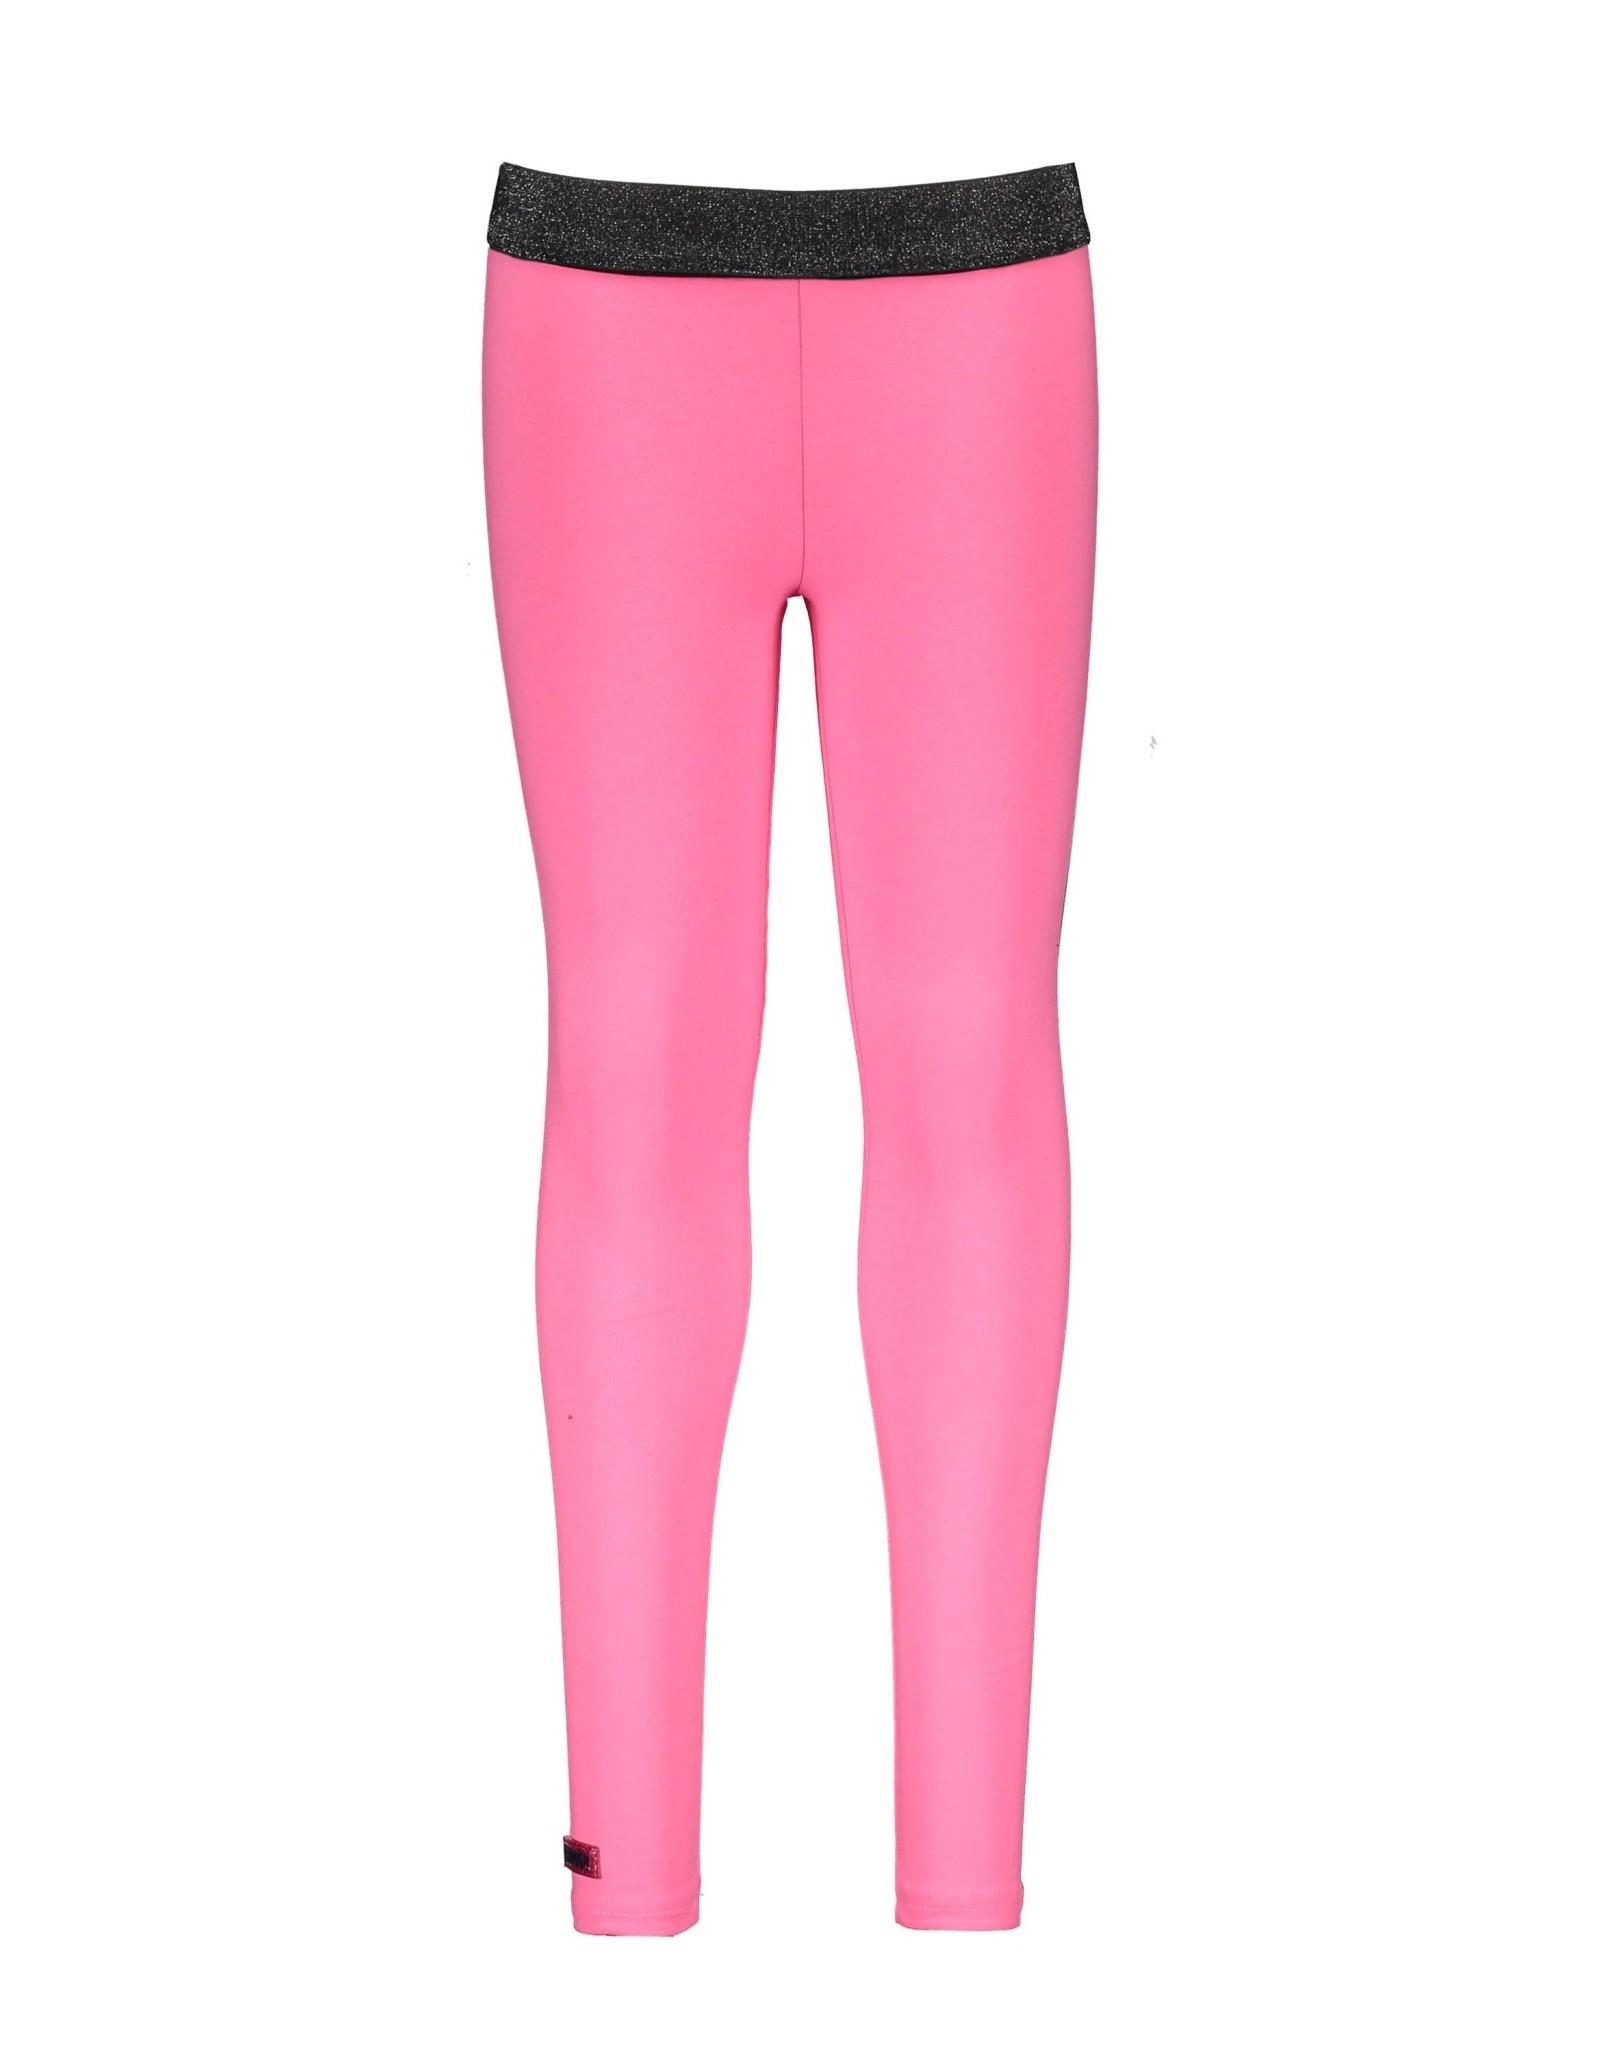 B.Nosy B.Nosy meisjes legging Pink Glo